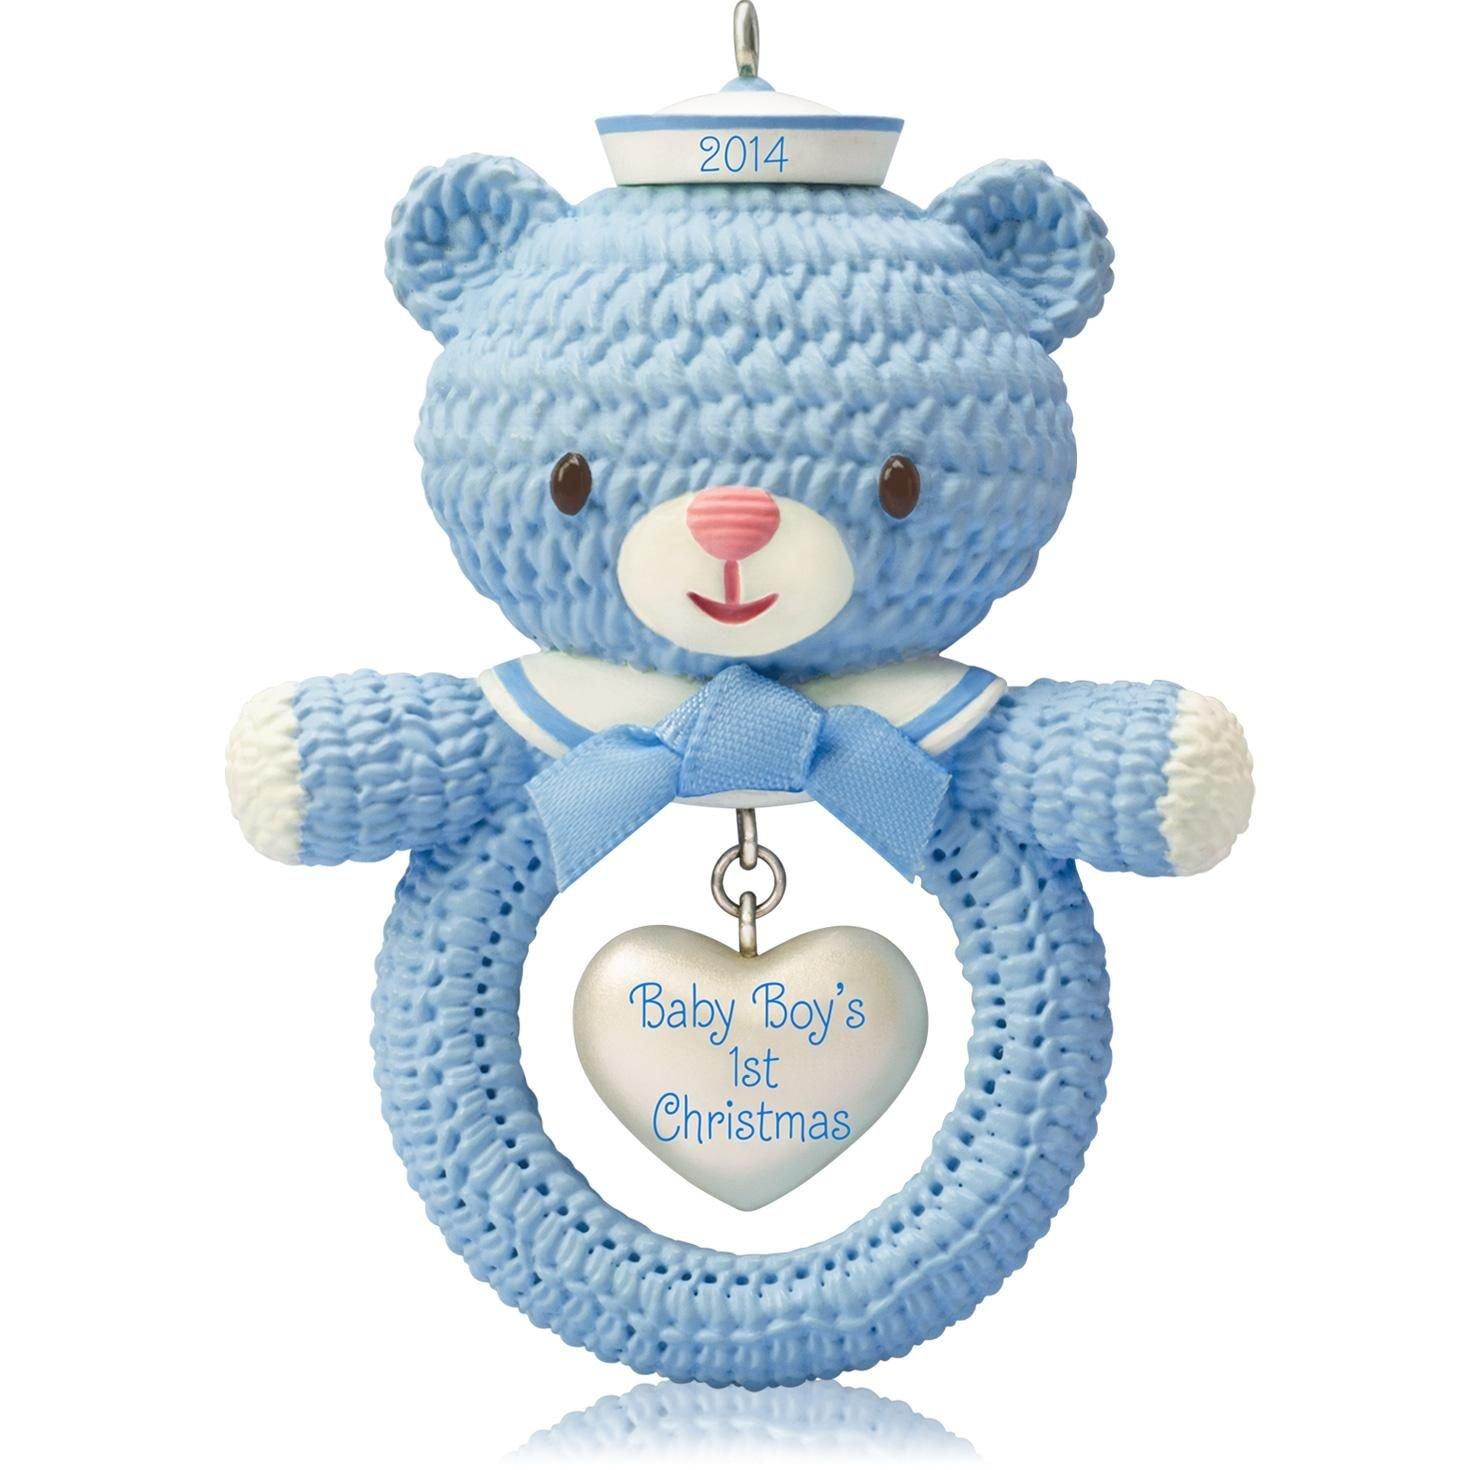 Amazon.com: 1 X Baby Boy's First Christmas - 2014 Hallmark ...